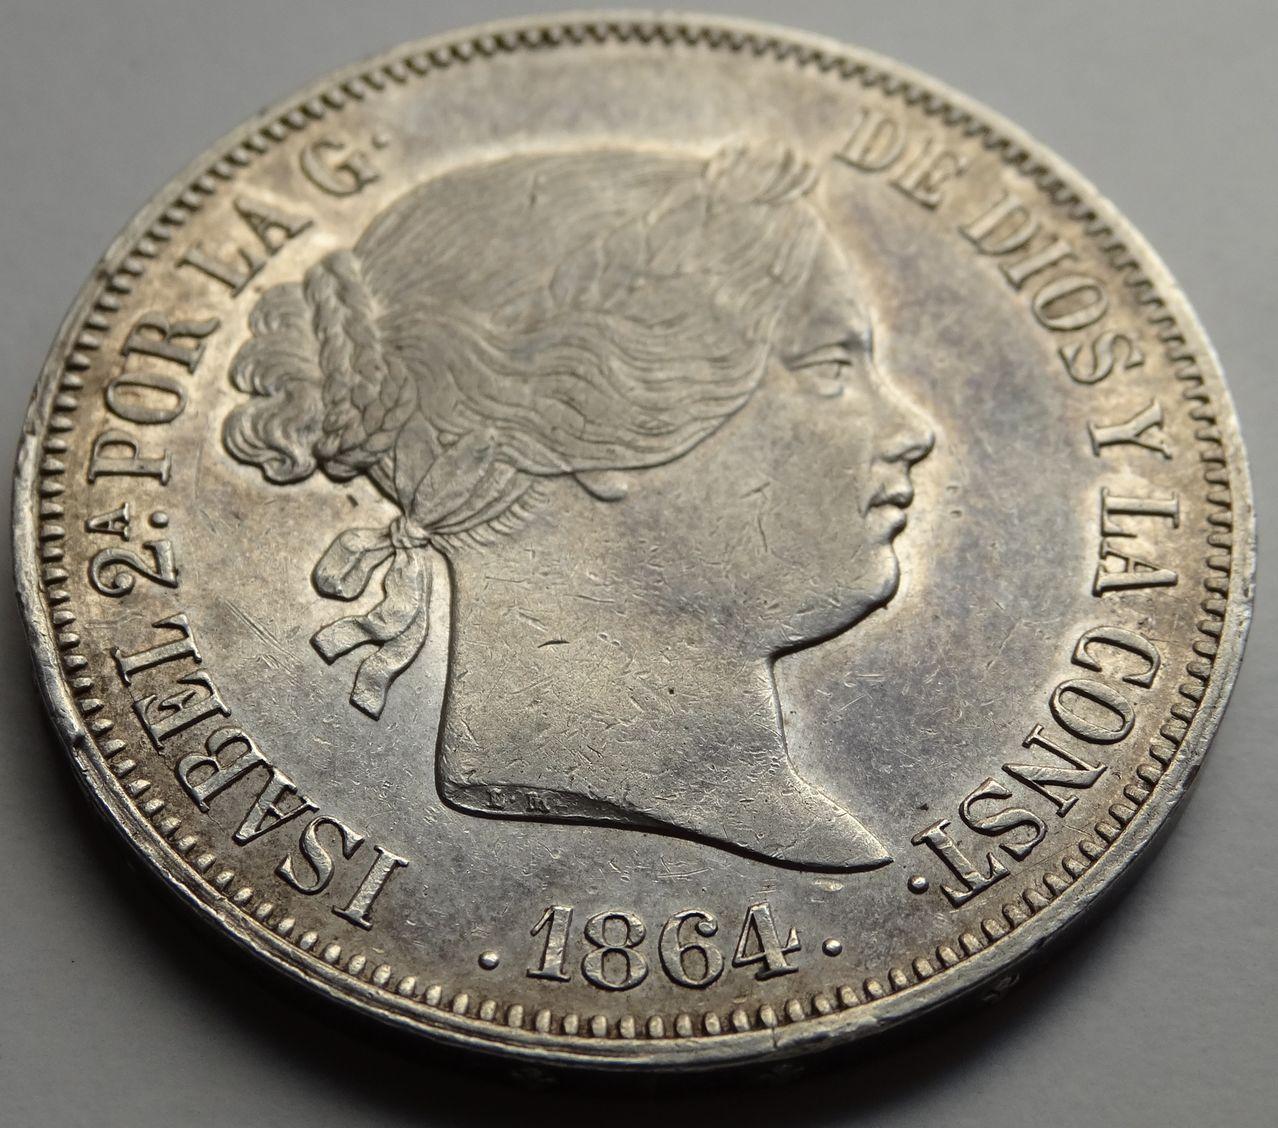 20 REALES ISABEL II 1864 MADRID DSC02287